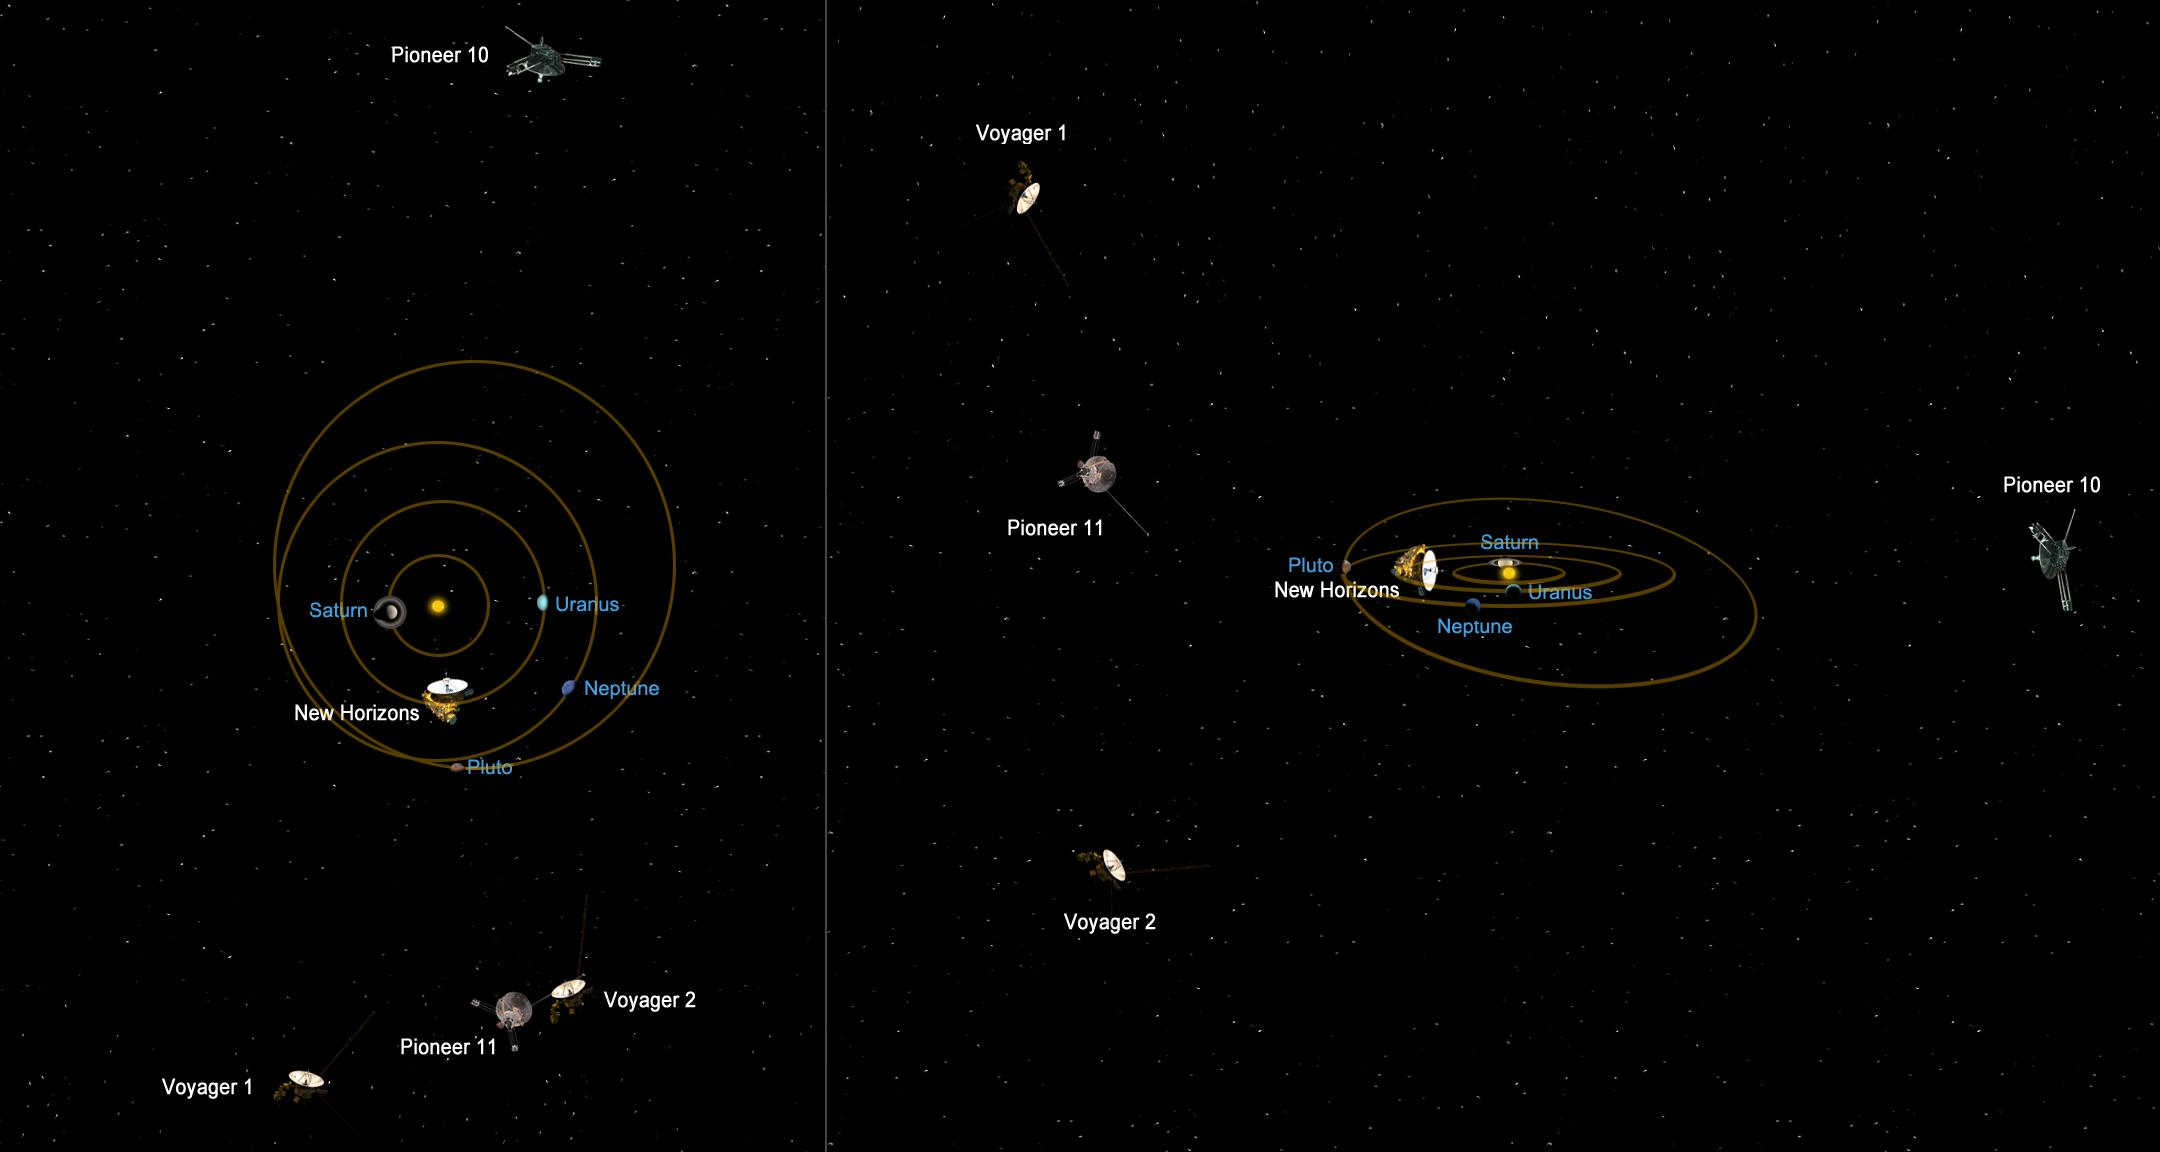 Misiuni spatiale NASA, Discul aurit de pe Voyager